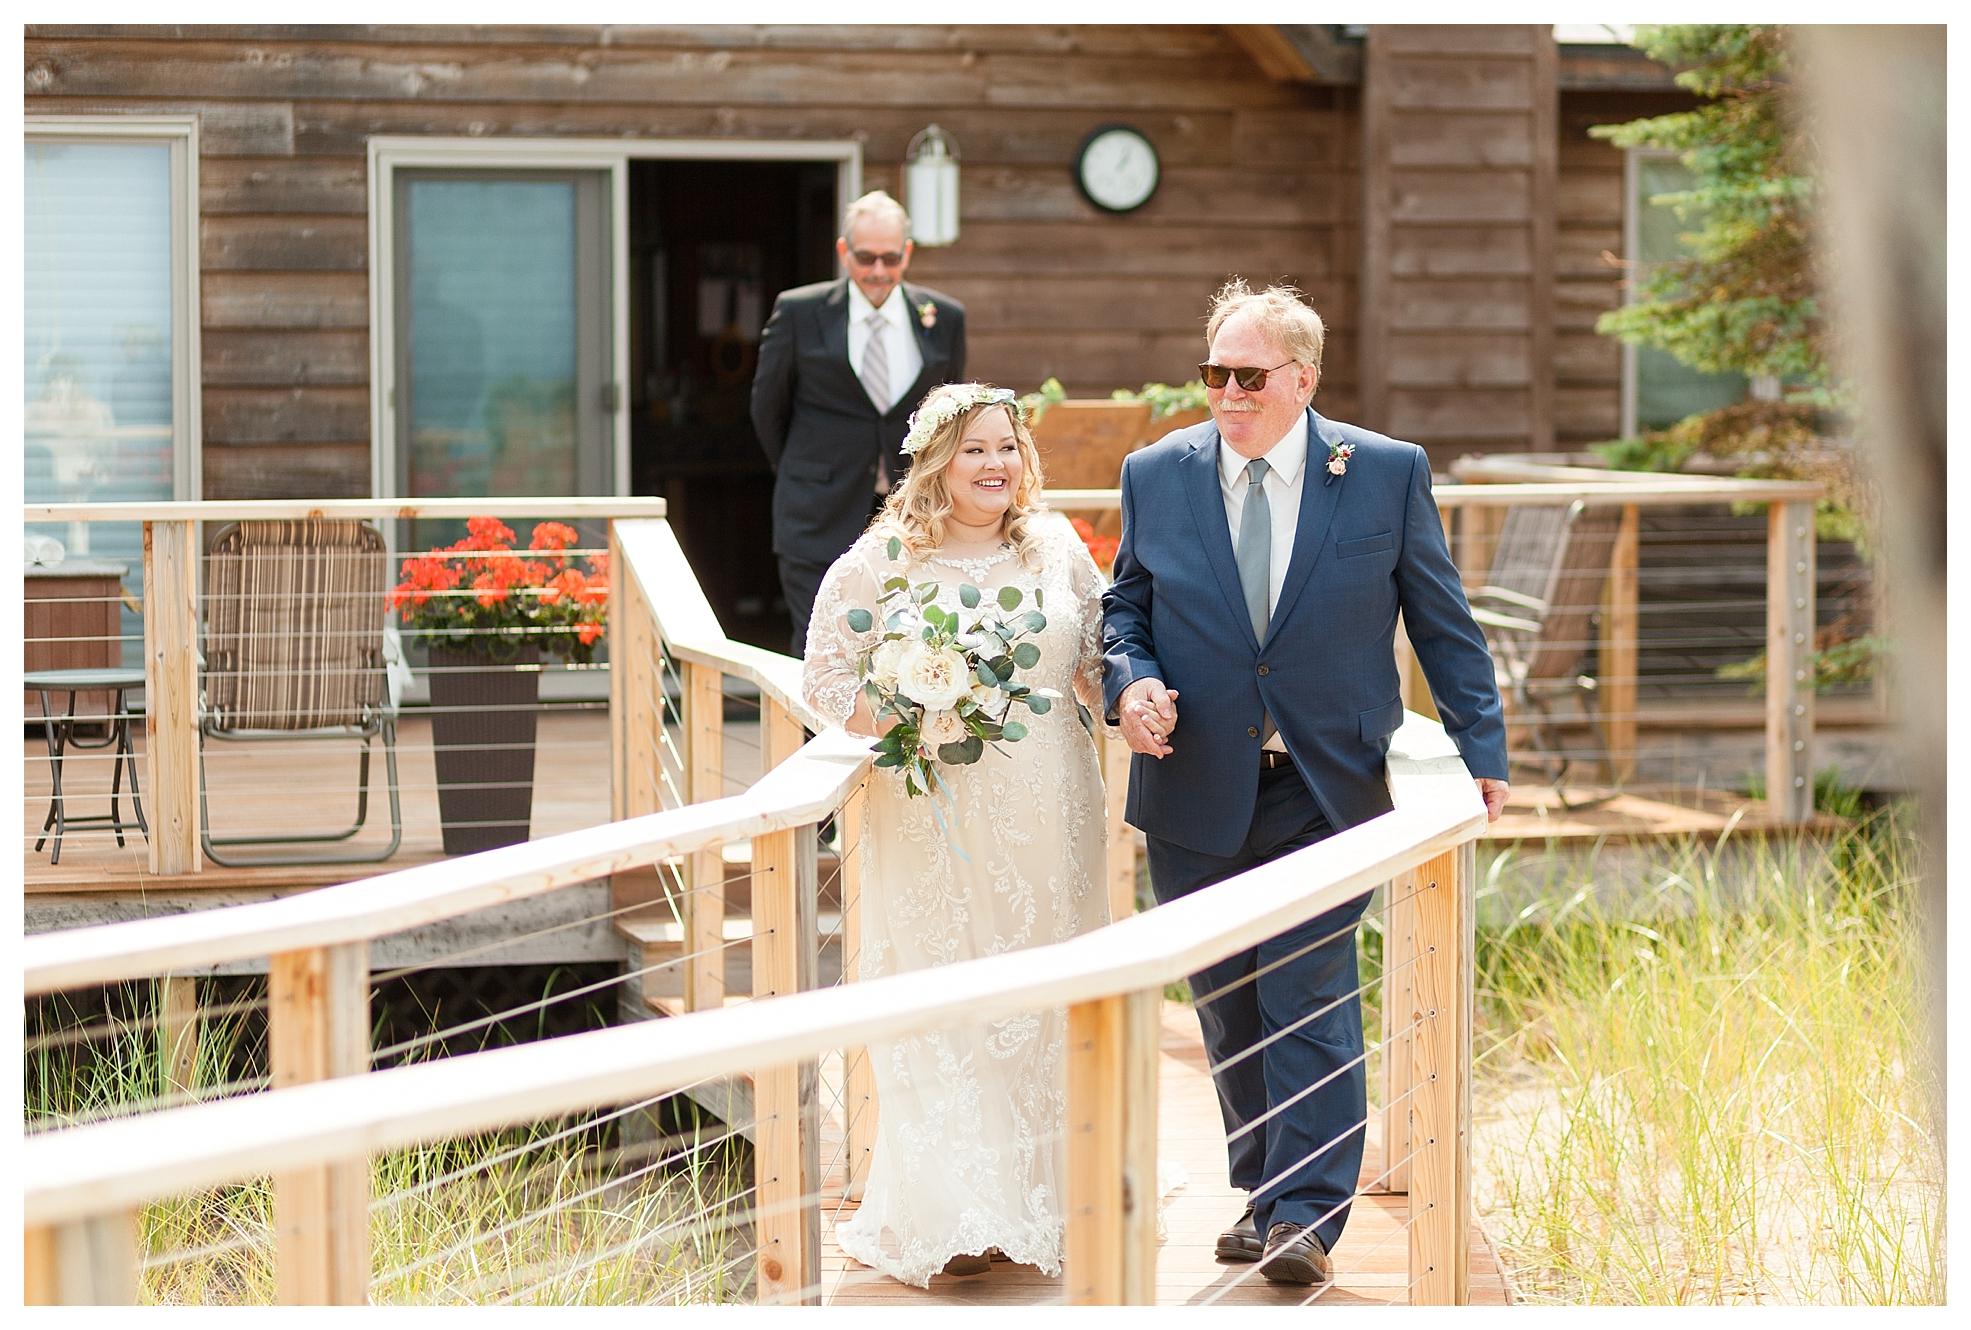 Lake Superior Eagle River MI Wedding_0486.jpg